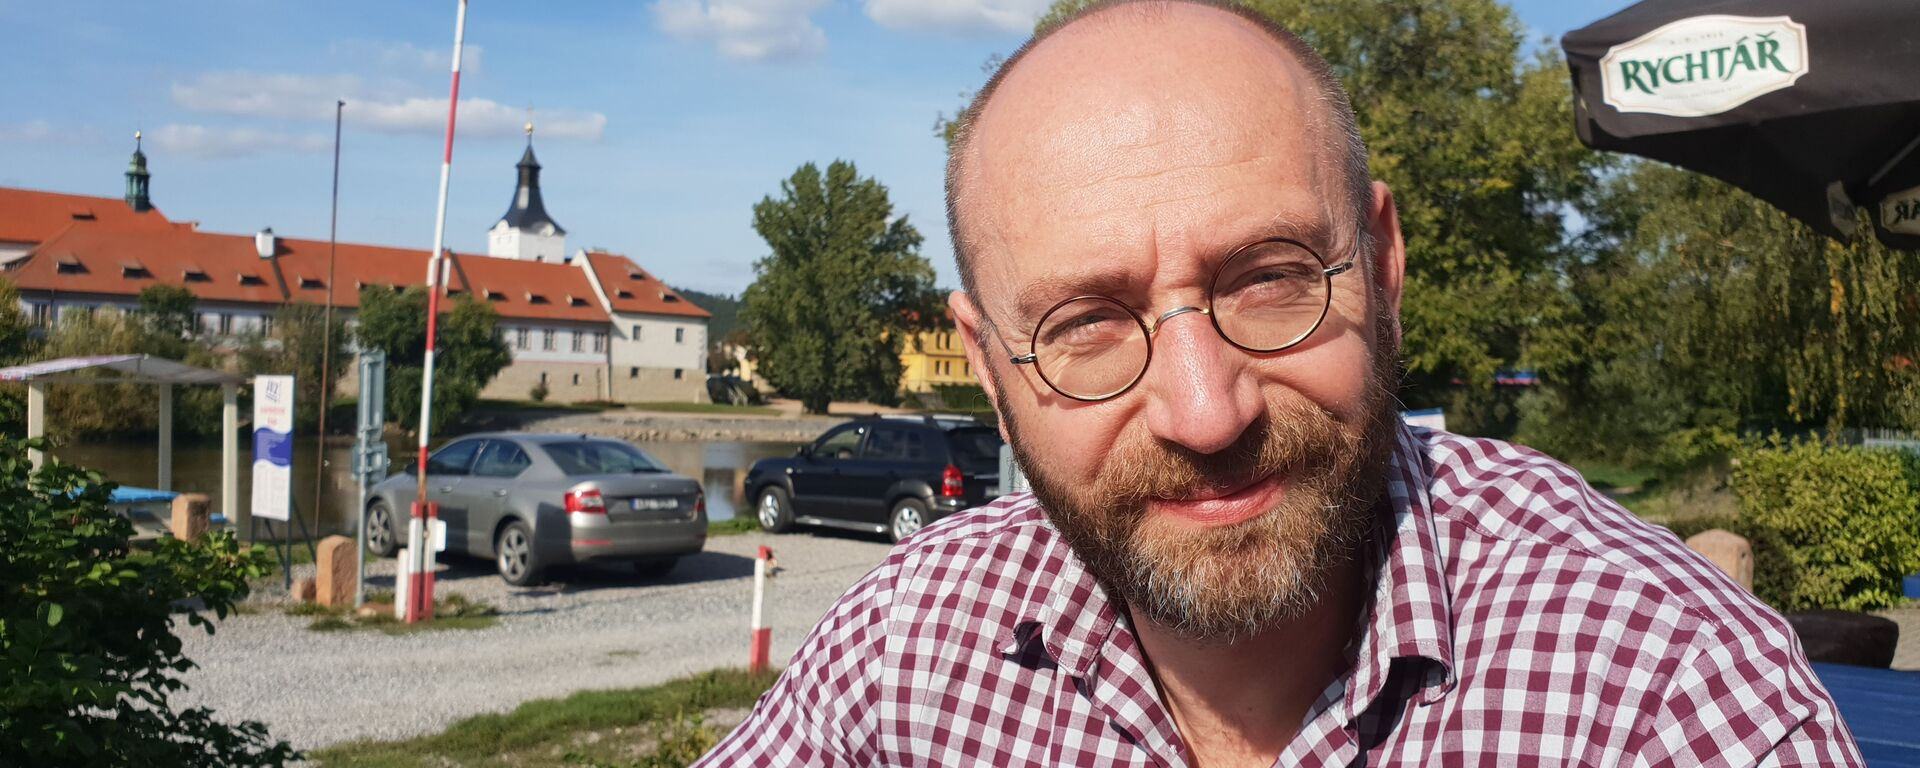 Sociolog Petr Hampl, Ph.D. - Sputnik Česká republika, 1920, 05.06.2021